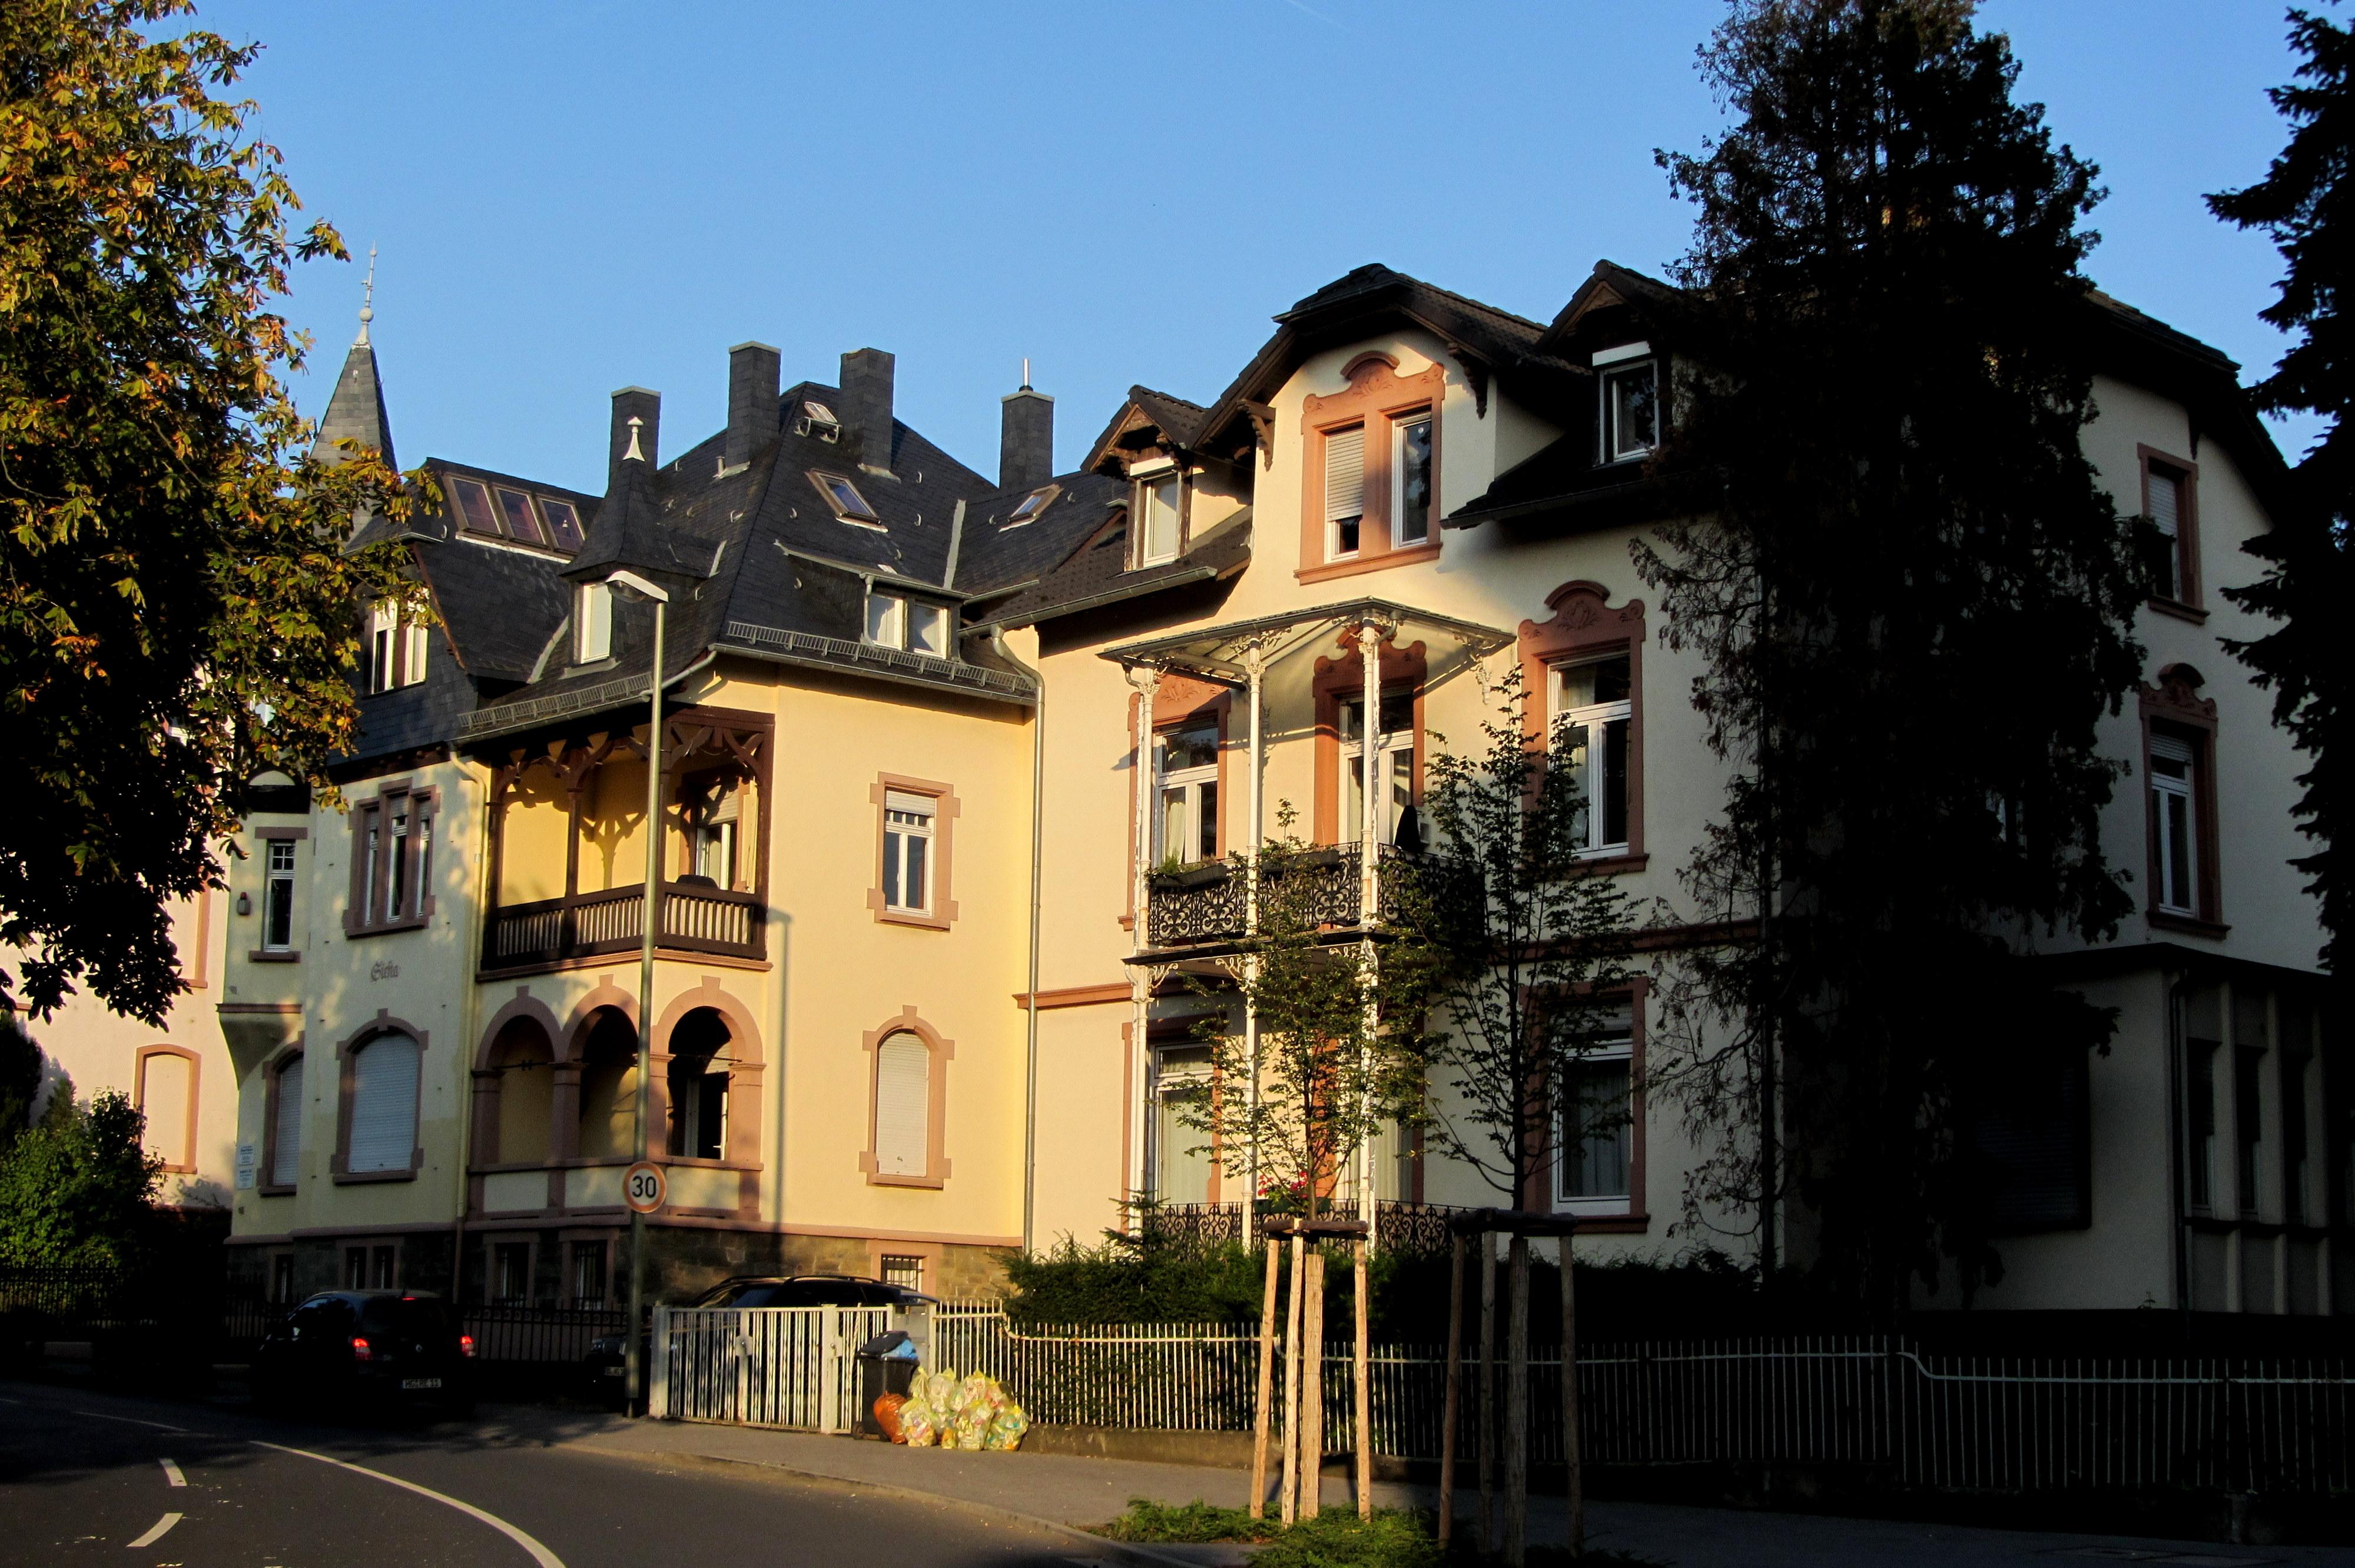 File:Bad Soden am Taunus - Kronberger Straße.JPG ...